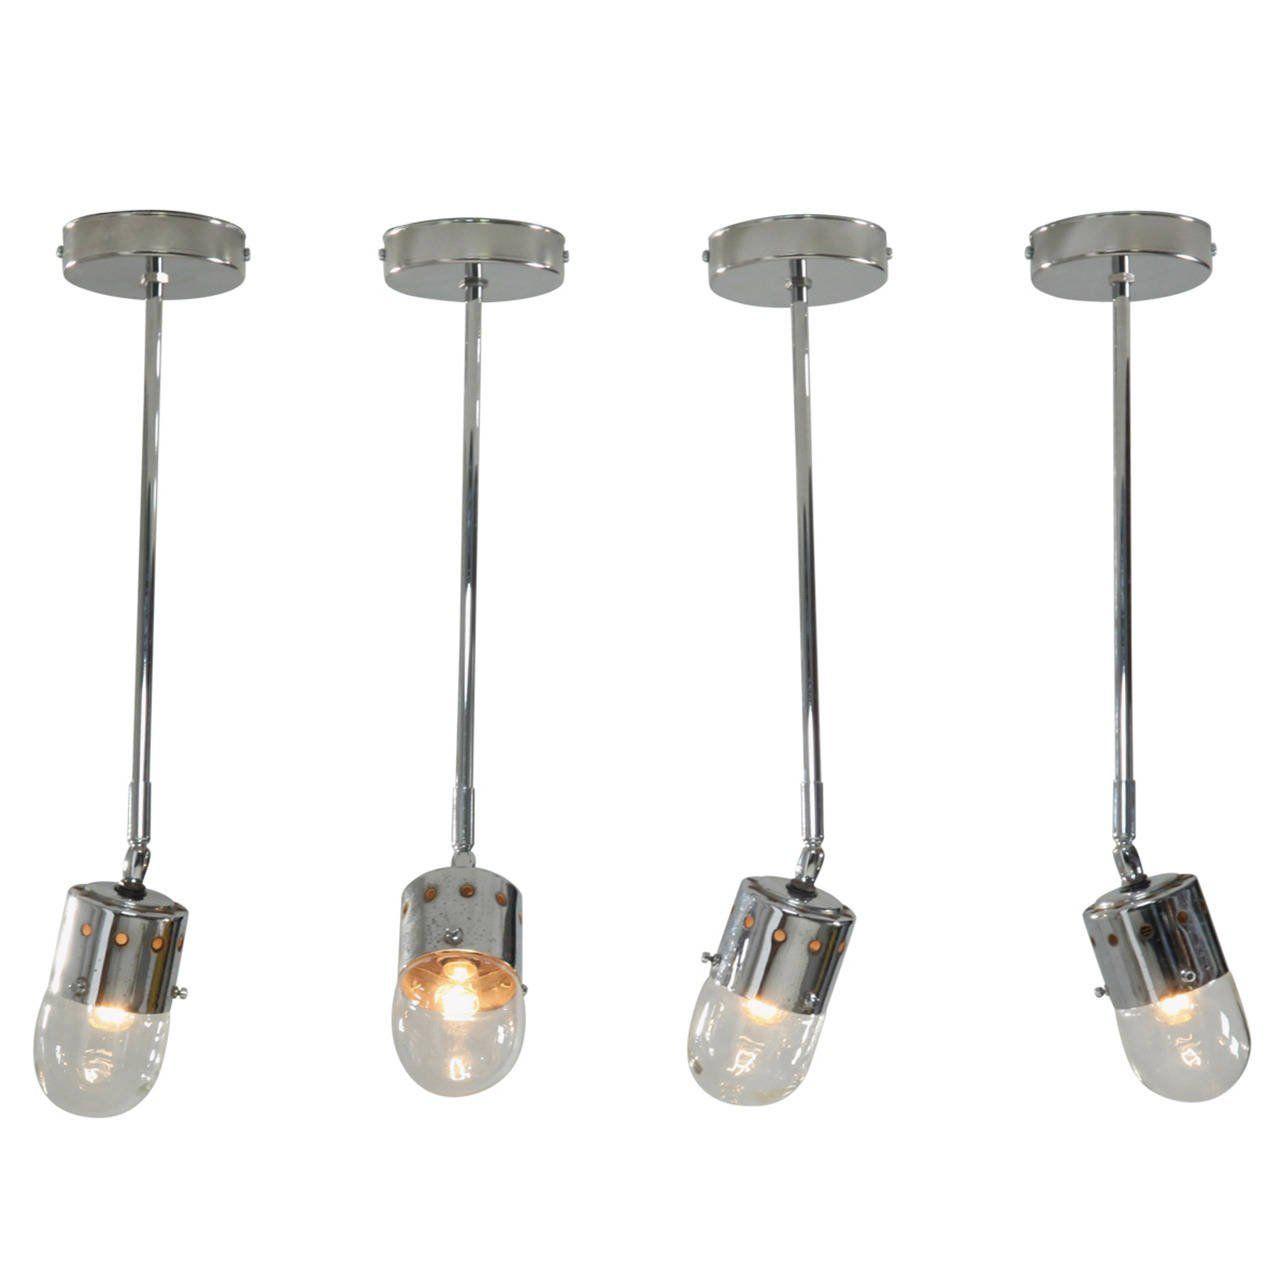 Set of four chrome minimalist italian ceiling lights s